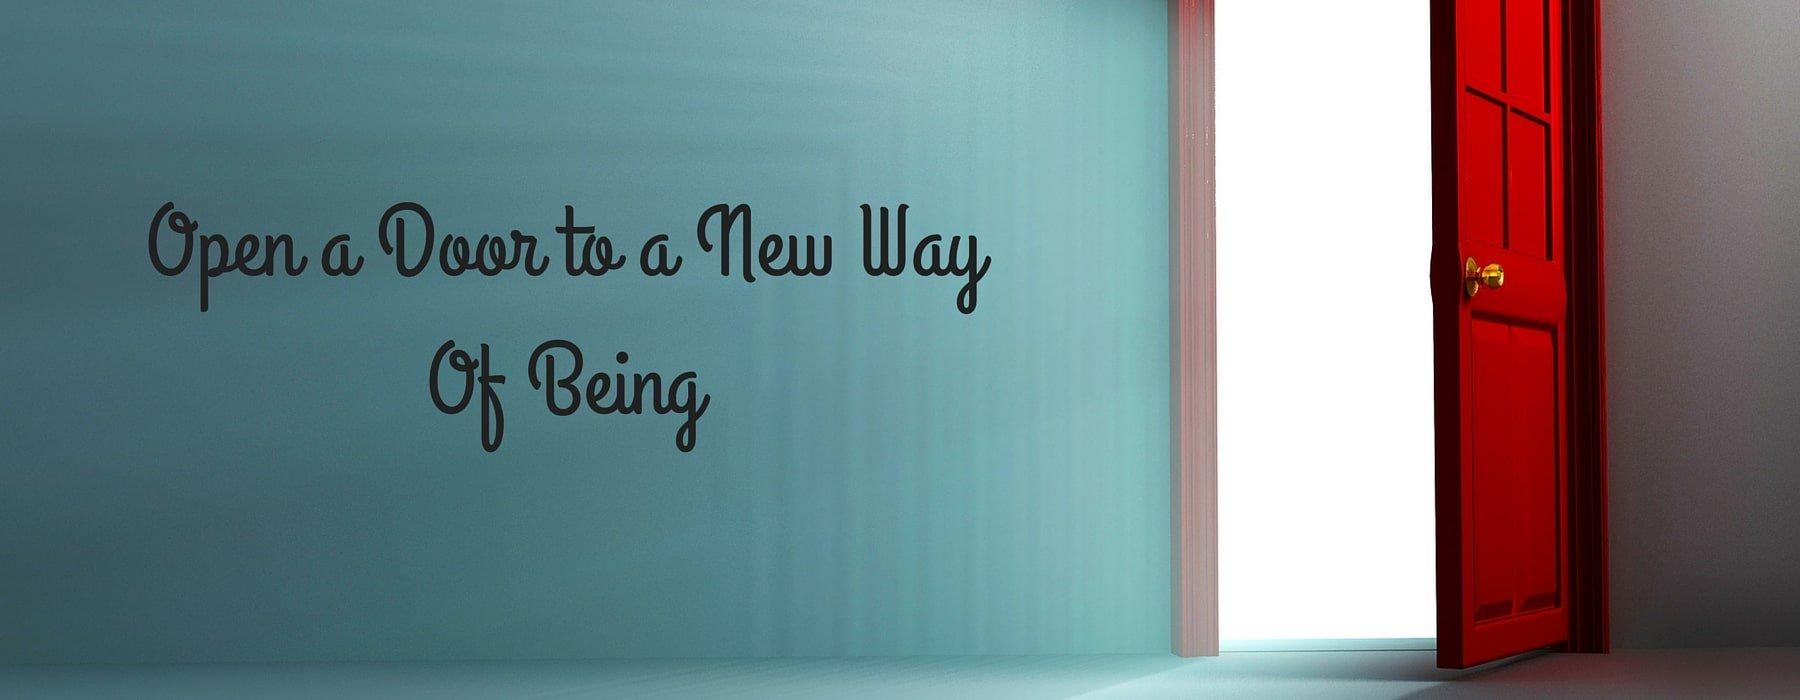 Open-a-Door-to-a-New-WayOf-Being